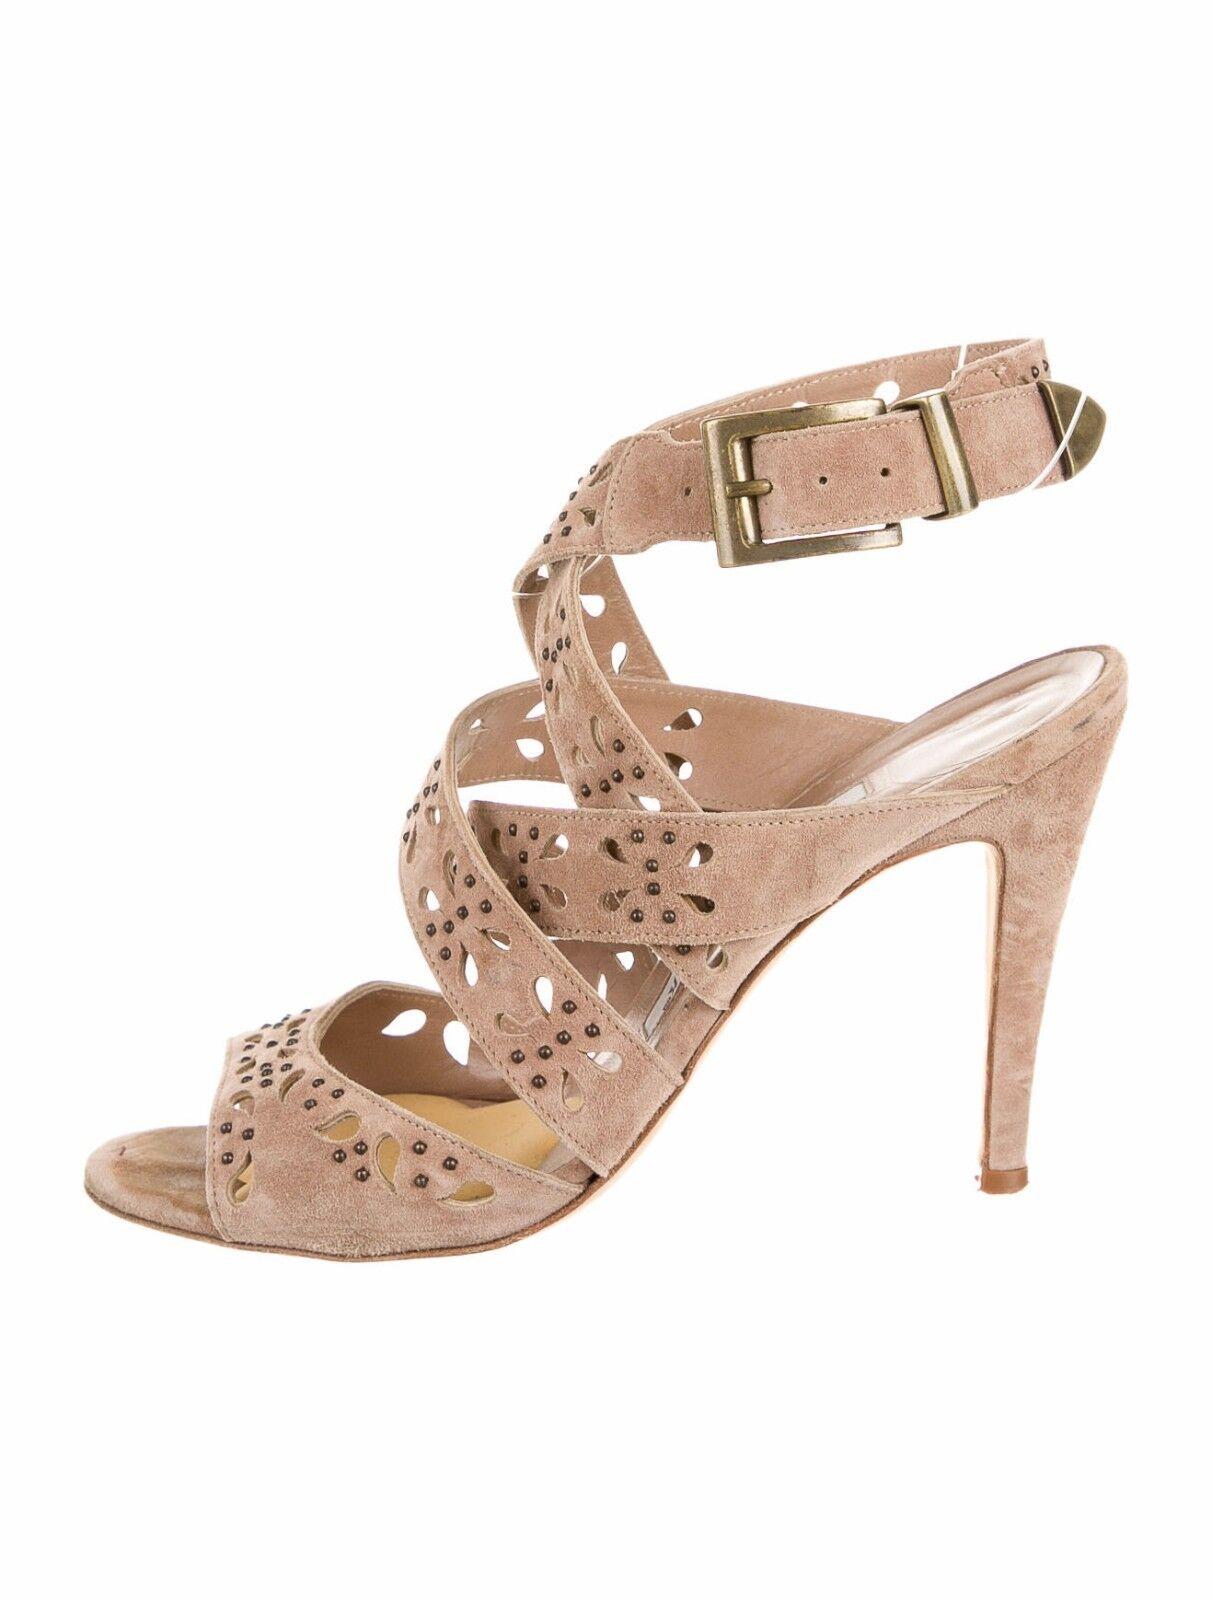 Nuevo Lezza Manolo BLAHNIK de de de gamuza marrón amarillento desnudo Sandalias Zapatos 40.5 10.5 10  en stock